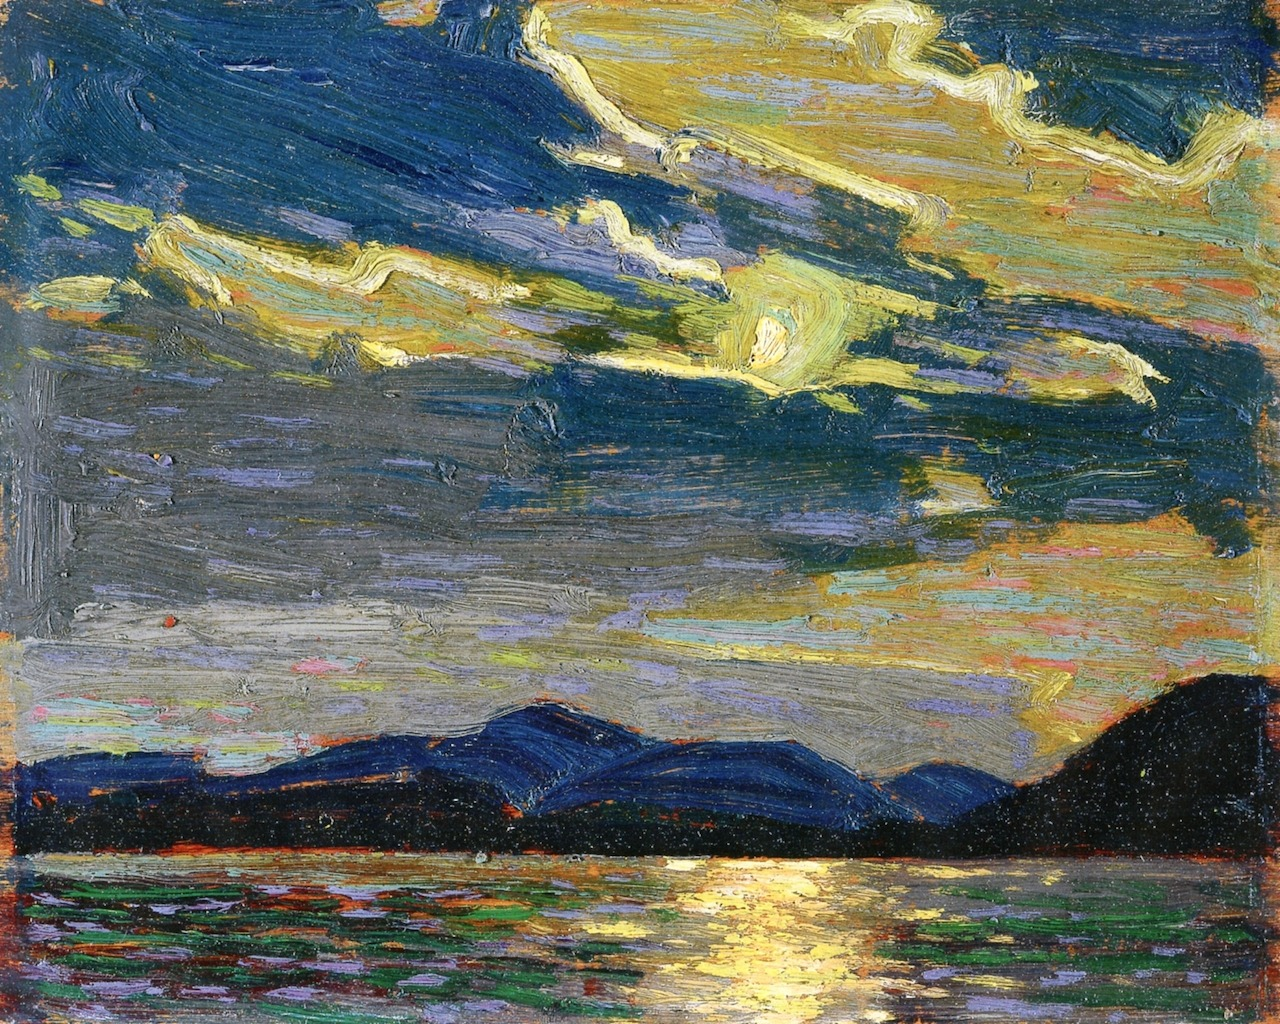 "dappledwithshadow:"" Hot Summer MoonlightTom Thomson1915National Gallery of Canada - Ottawa (Canada)PaintingHeight: 21.4 cm (8.43 in.), Width: 26.7 cm (10.51 in.)"""